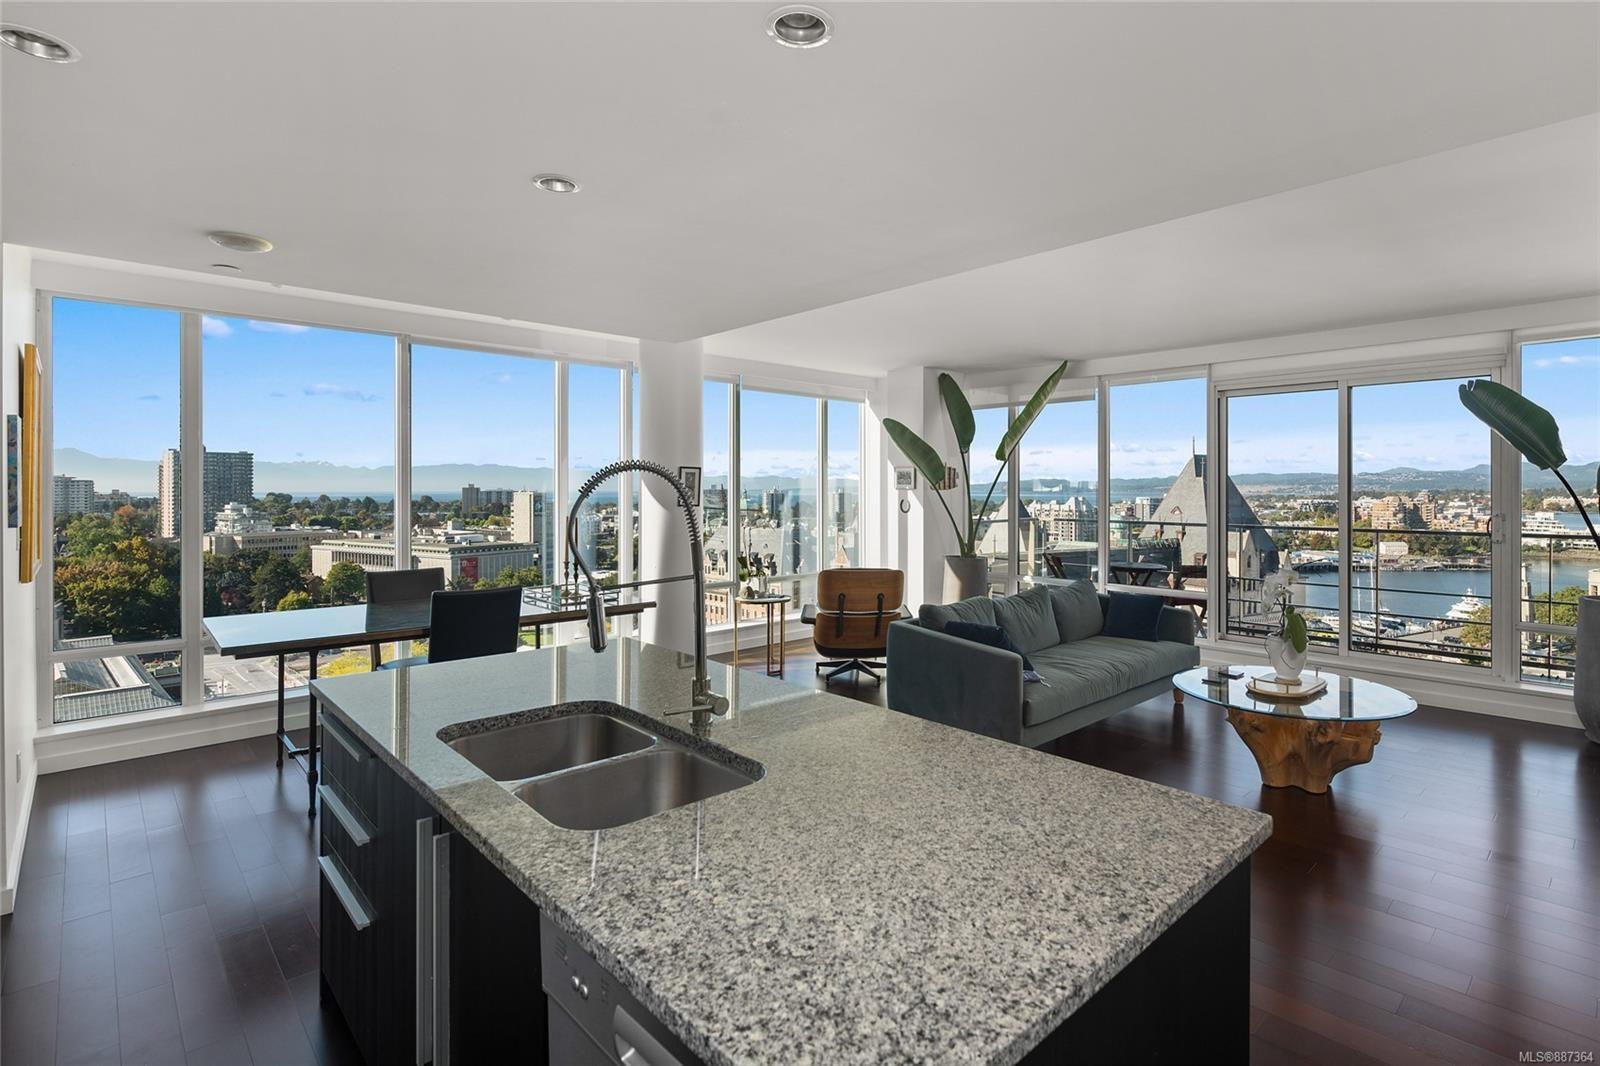 Main Photo: 1606 707 Courtney St in Victoria: Vi Downtown Condo for sale : MLS®# 887364